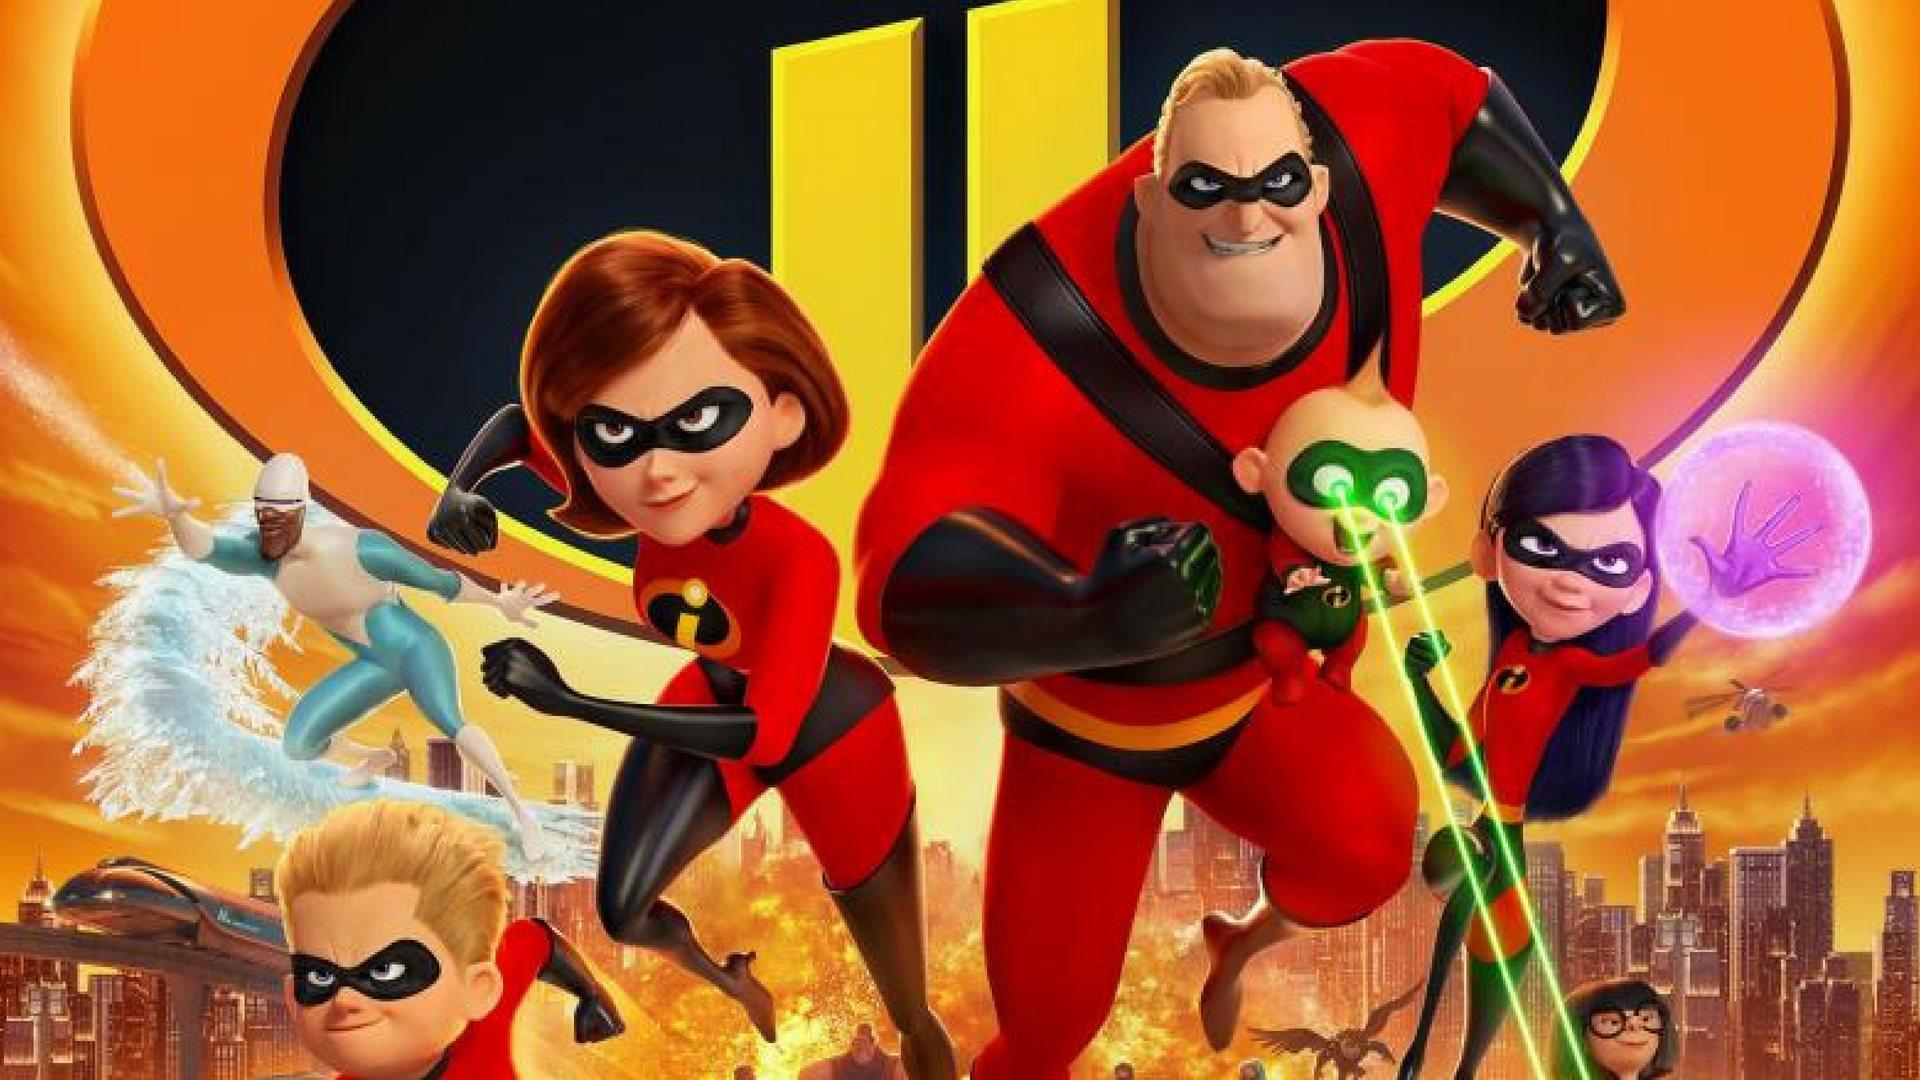 De Utrolige, De Utrolige 2, Disney, Pixar, biograffilm, familiefilm, spillefilm, film, animationsfilm, premiere